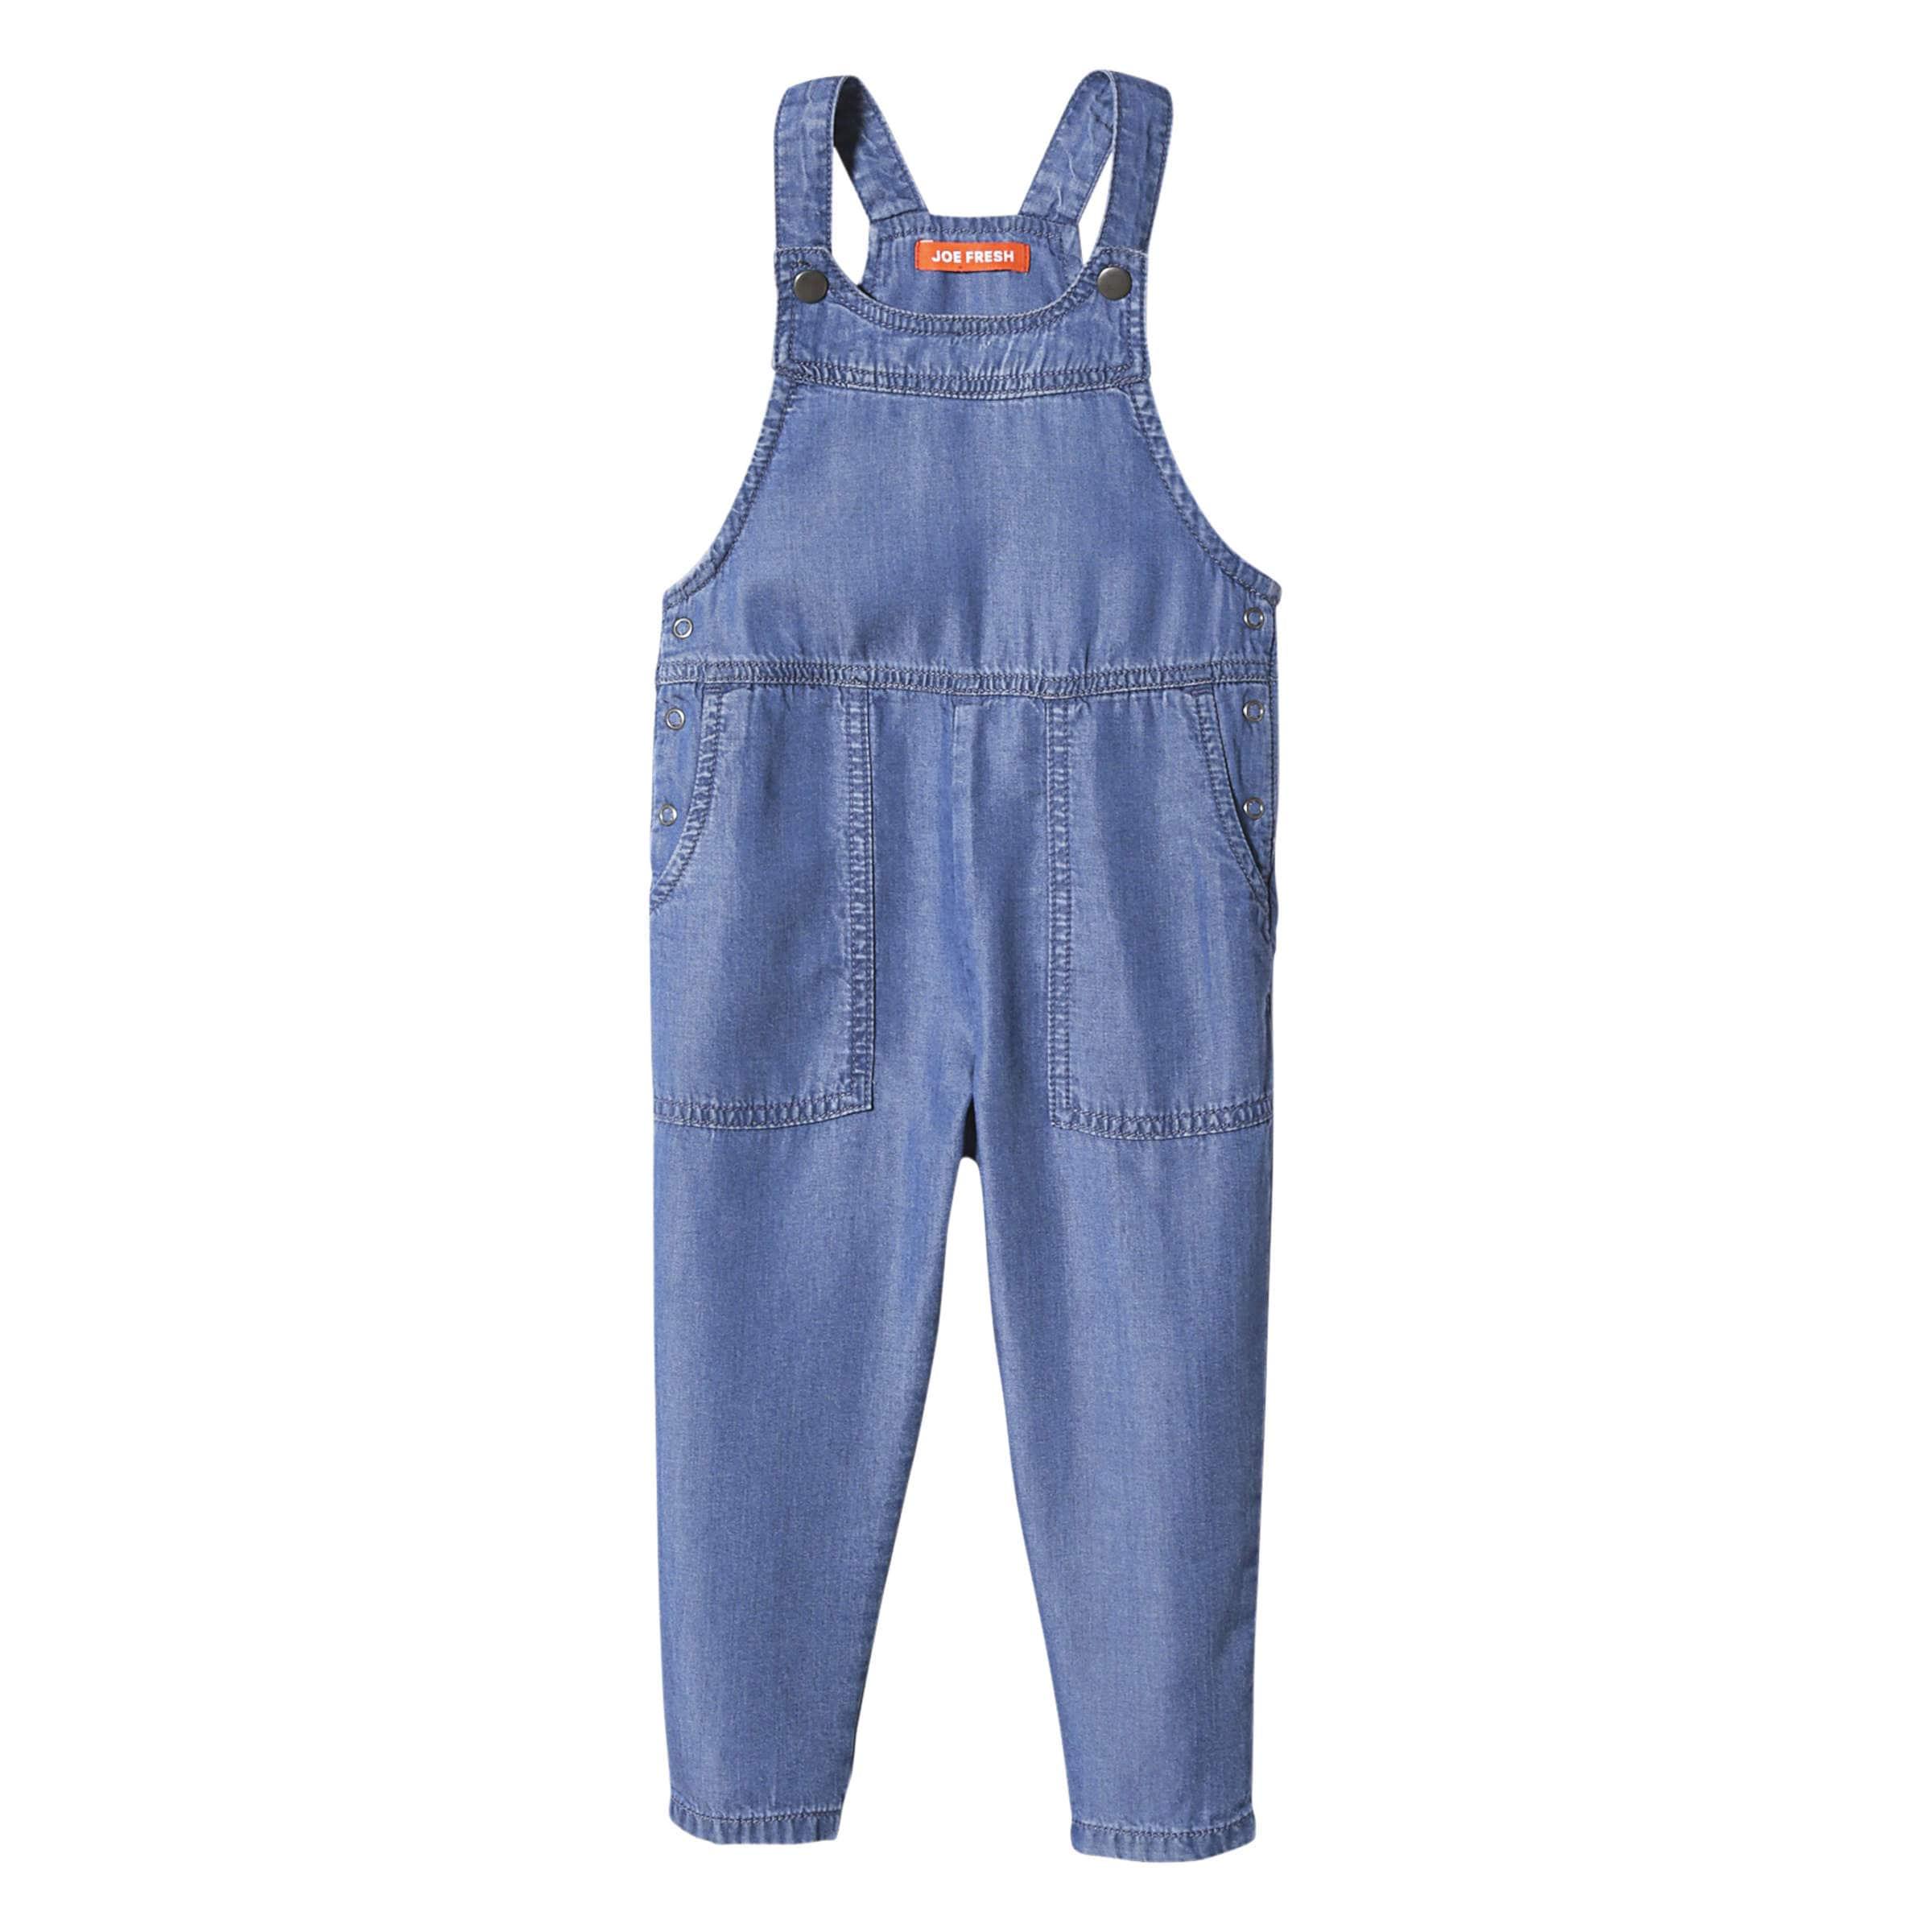 0458e4320c Toddler Girls  Denim Overalls in Medium Wash from Joe Fresh